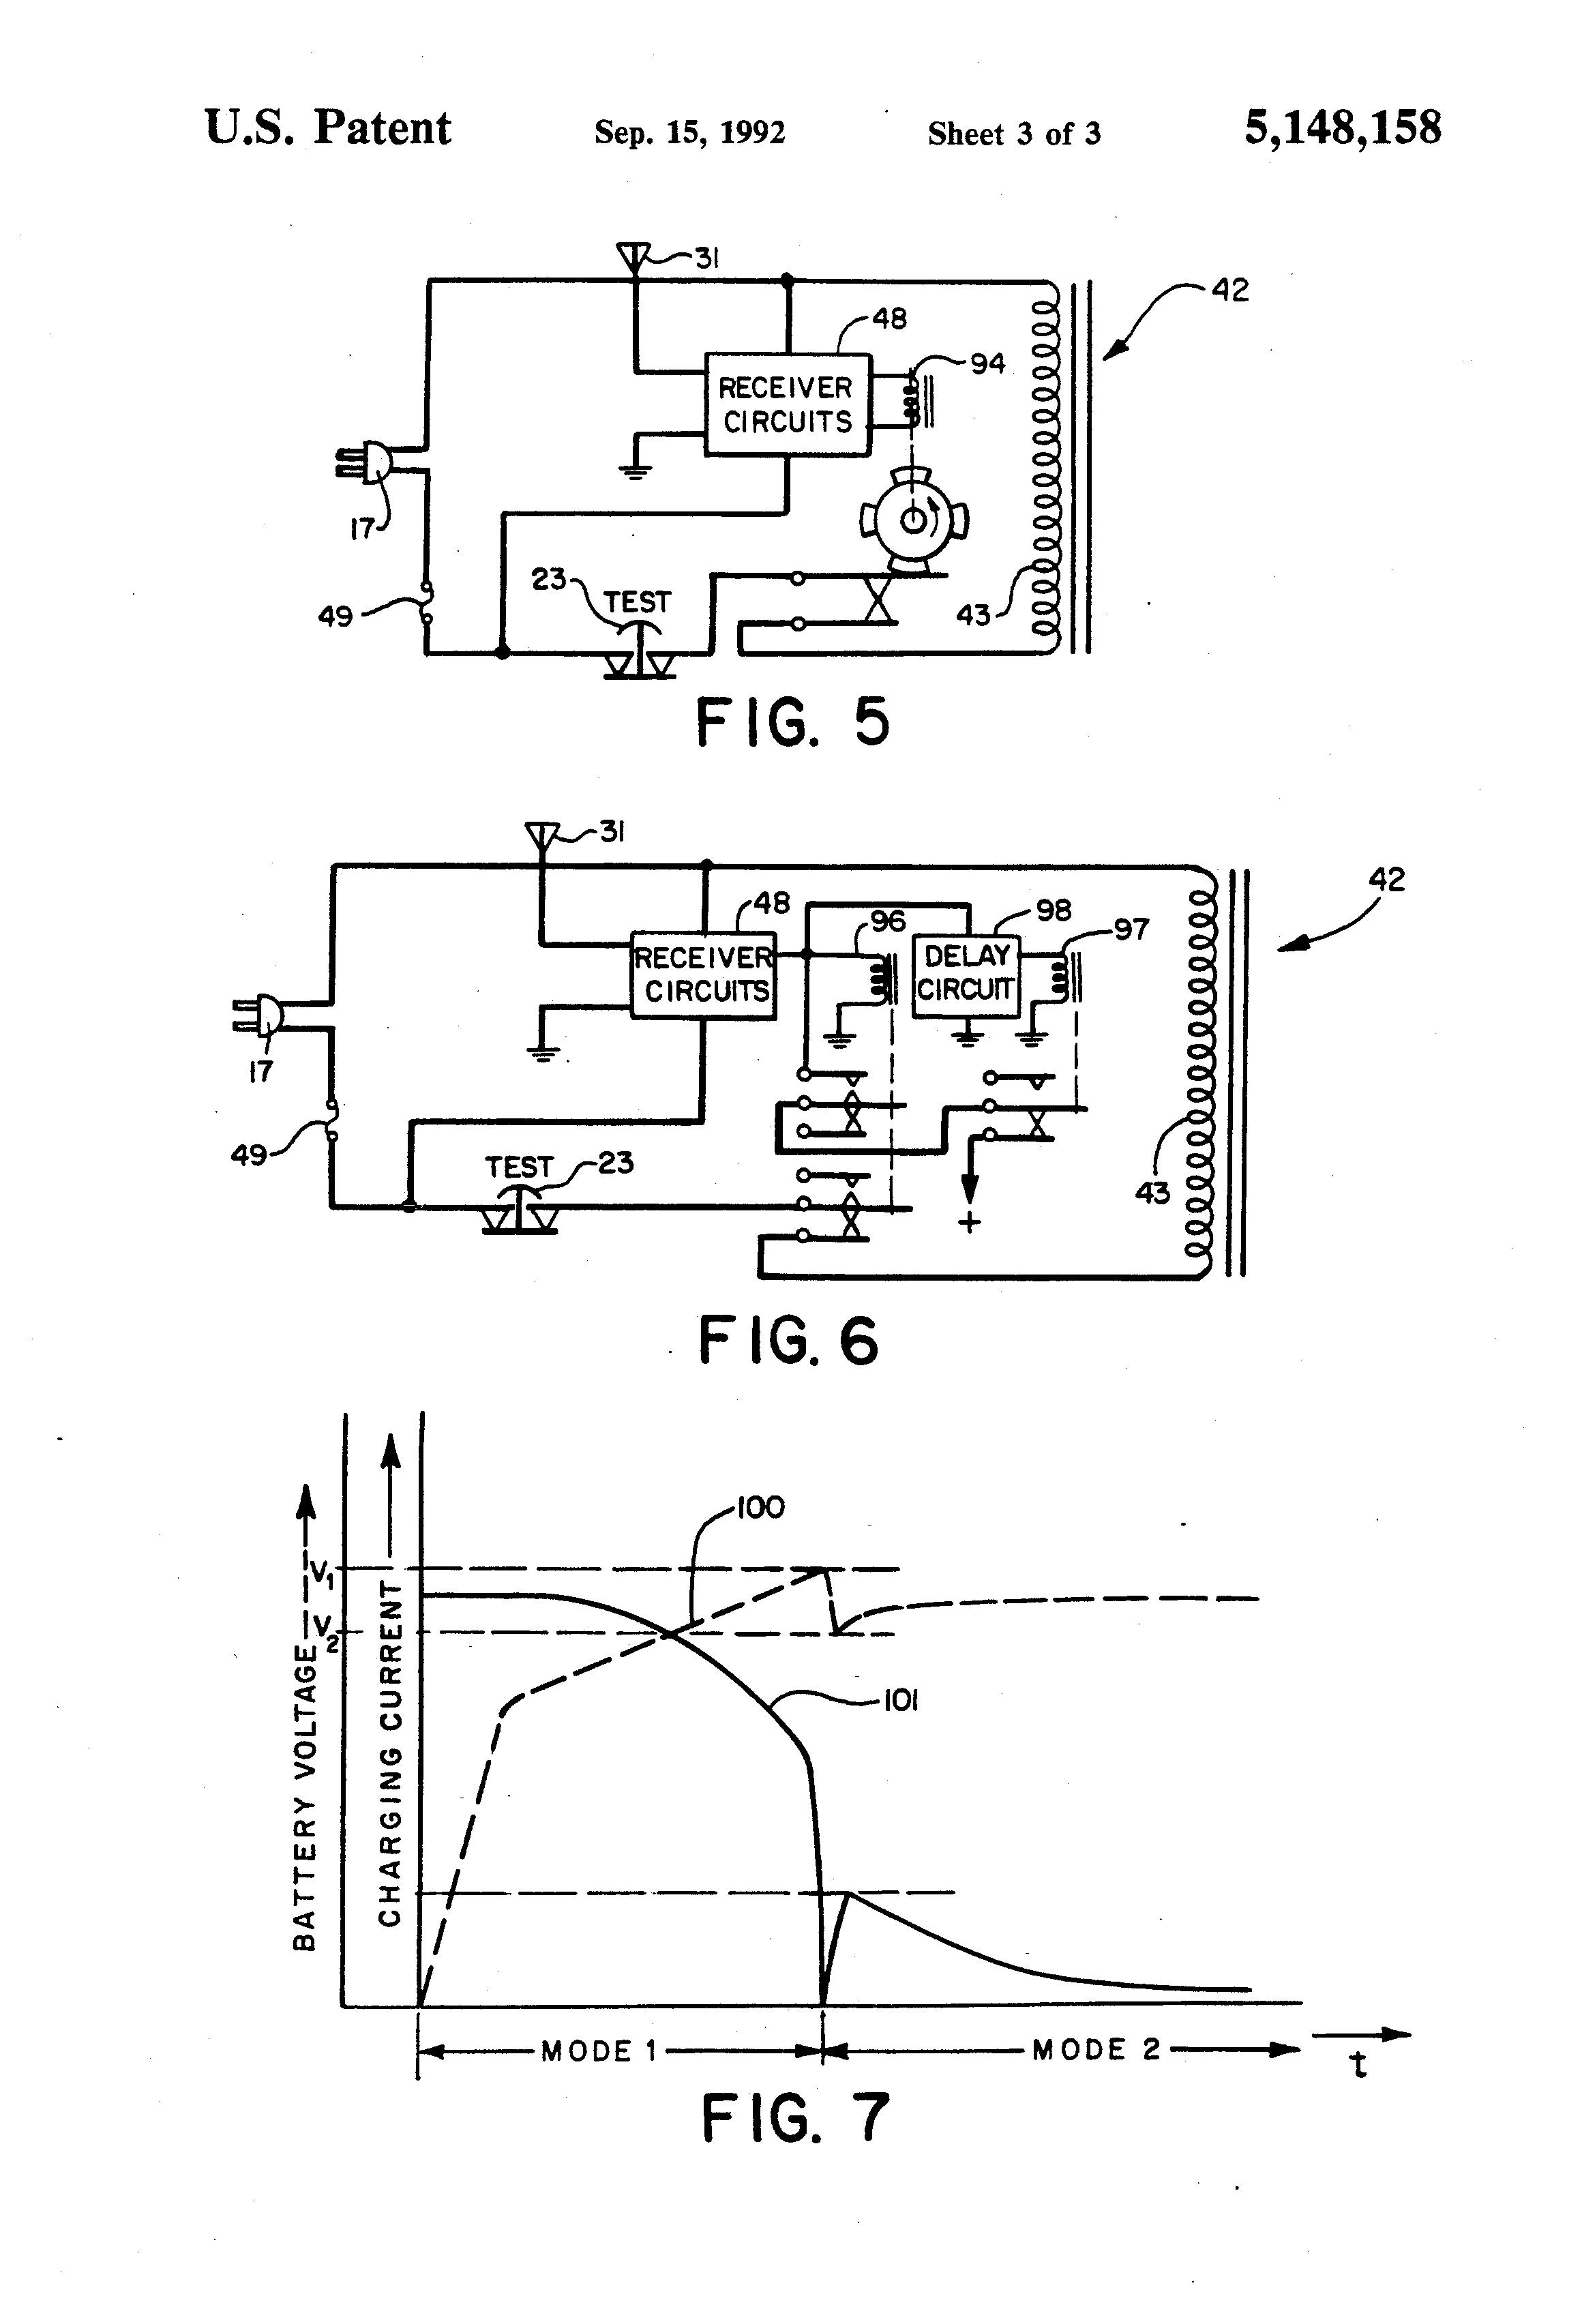 wiring diagram for emergency lighting valid diagram emergency inside emergency light wiring diagram 6416 [ 2320 x 3408 Pixel ]